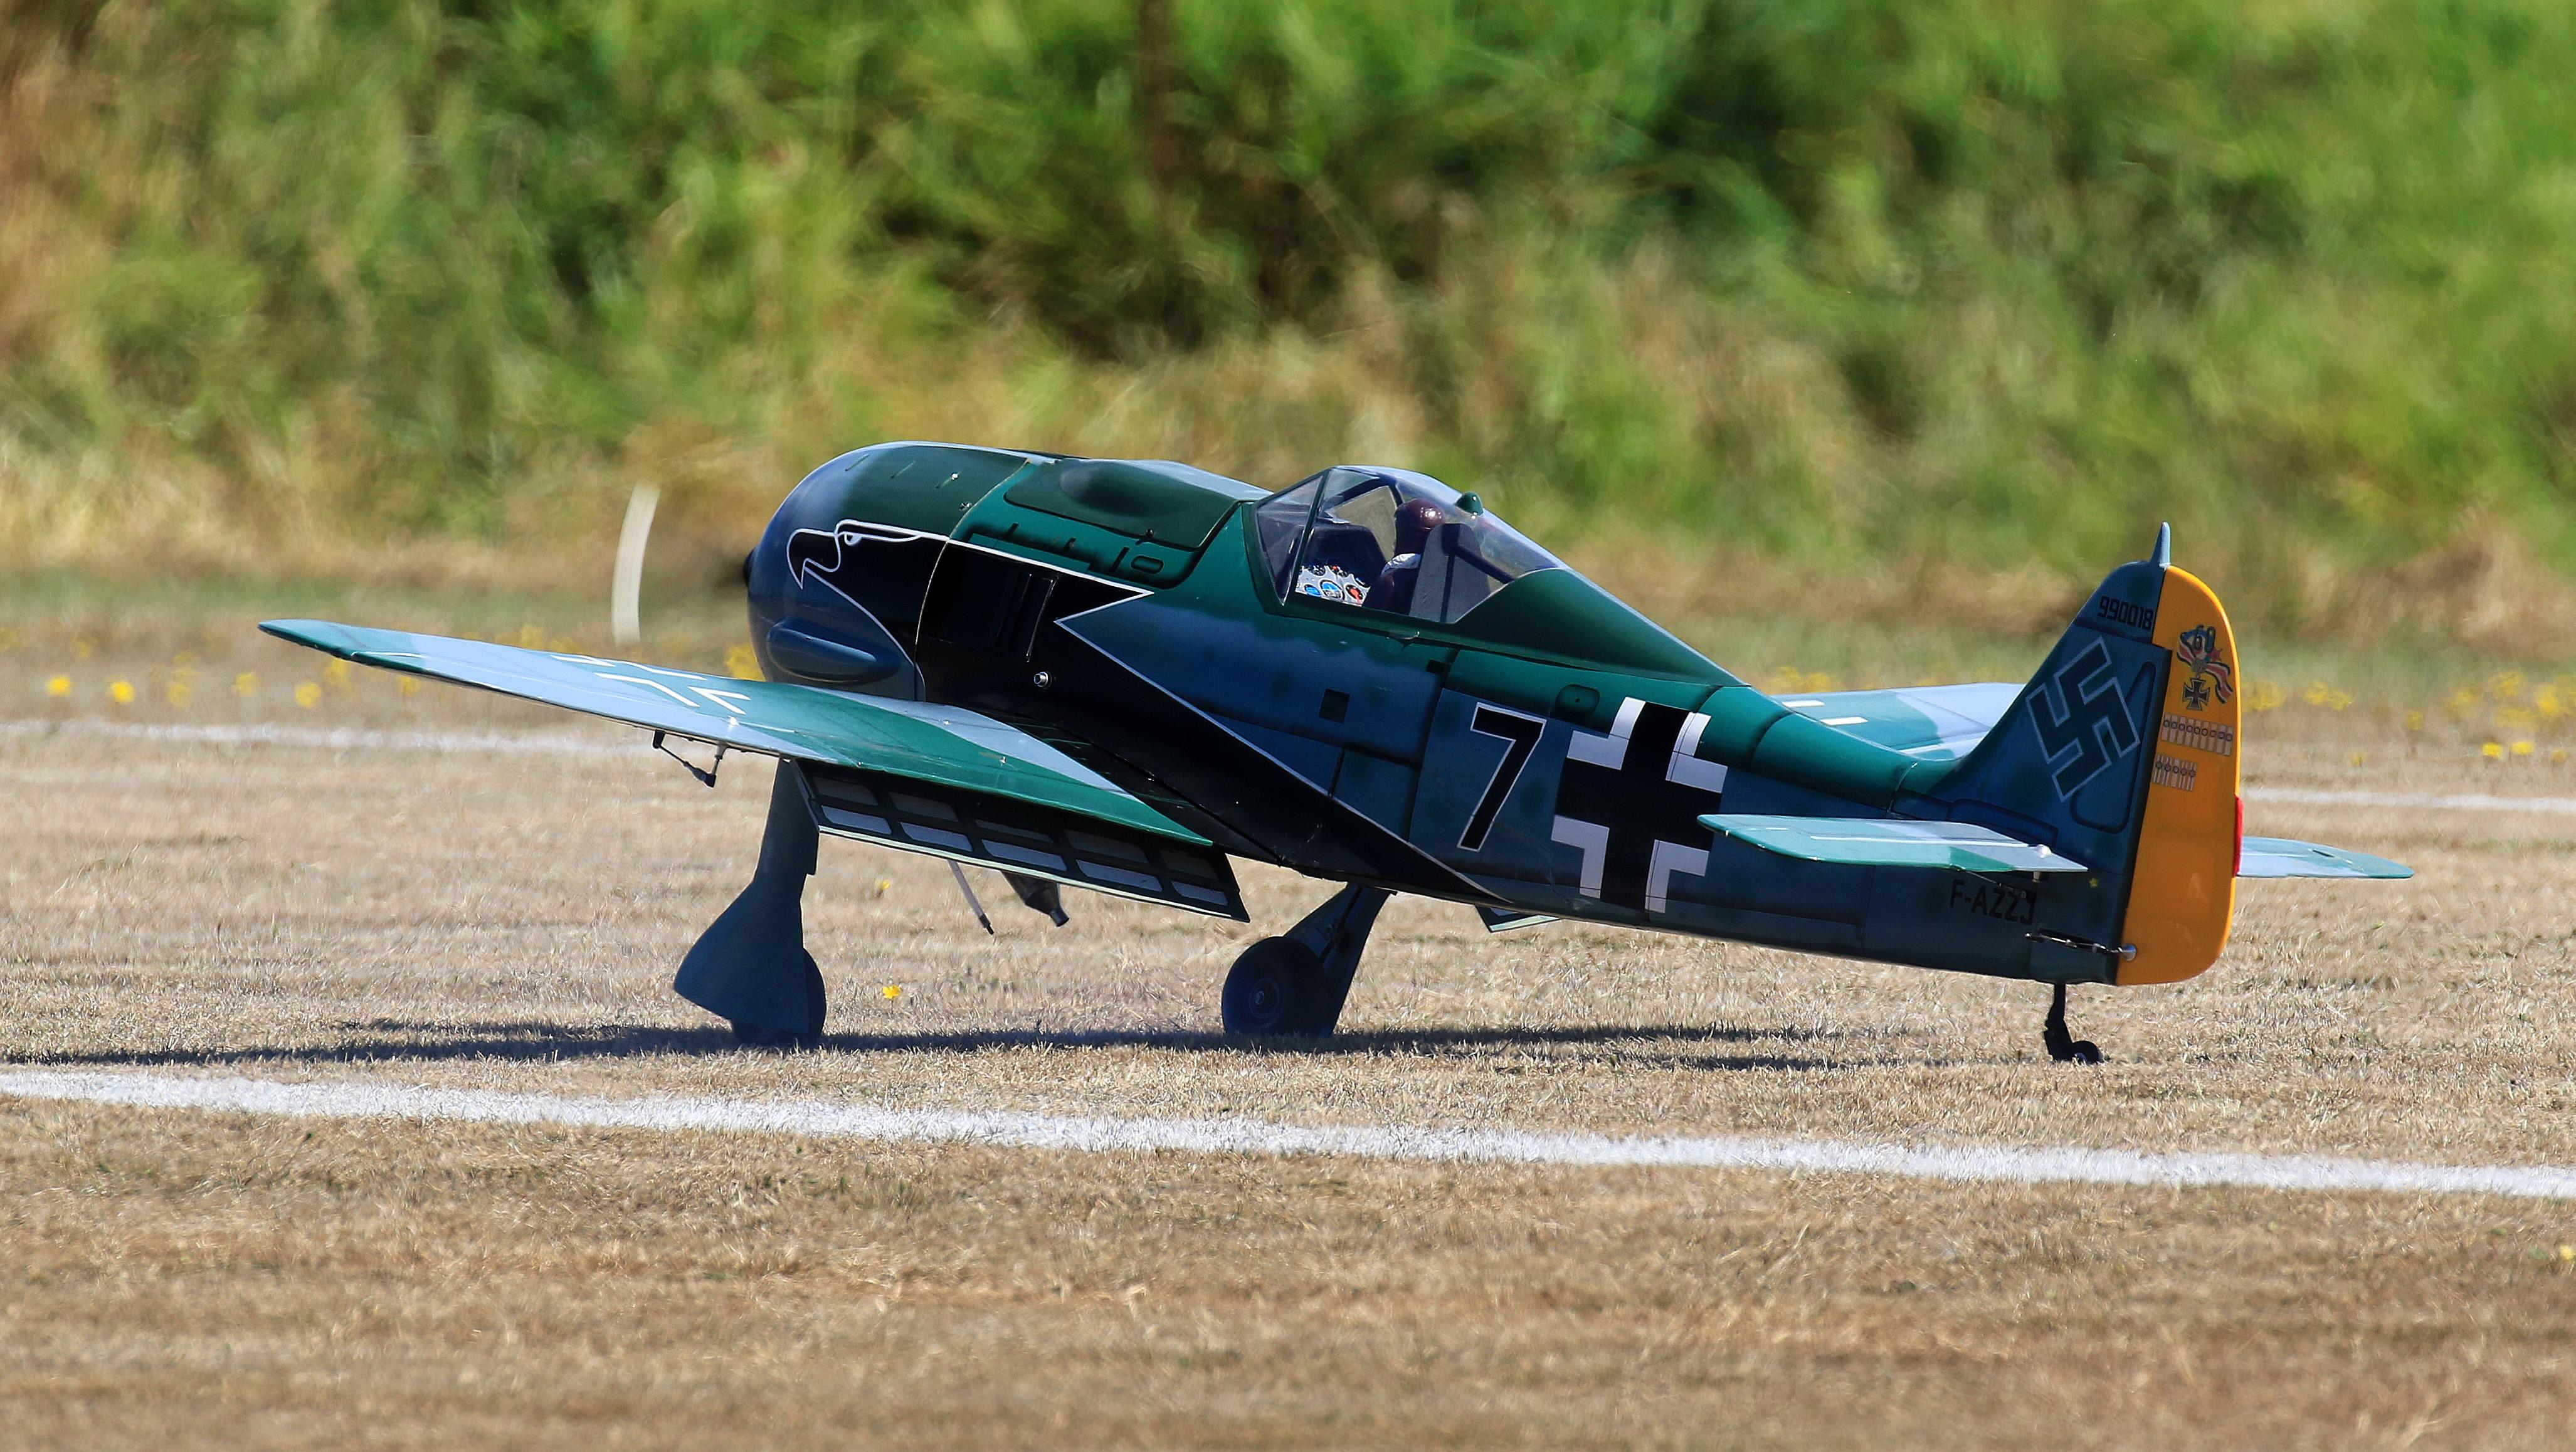 FW-190 02 LR.jpg